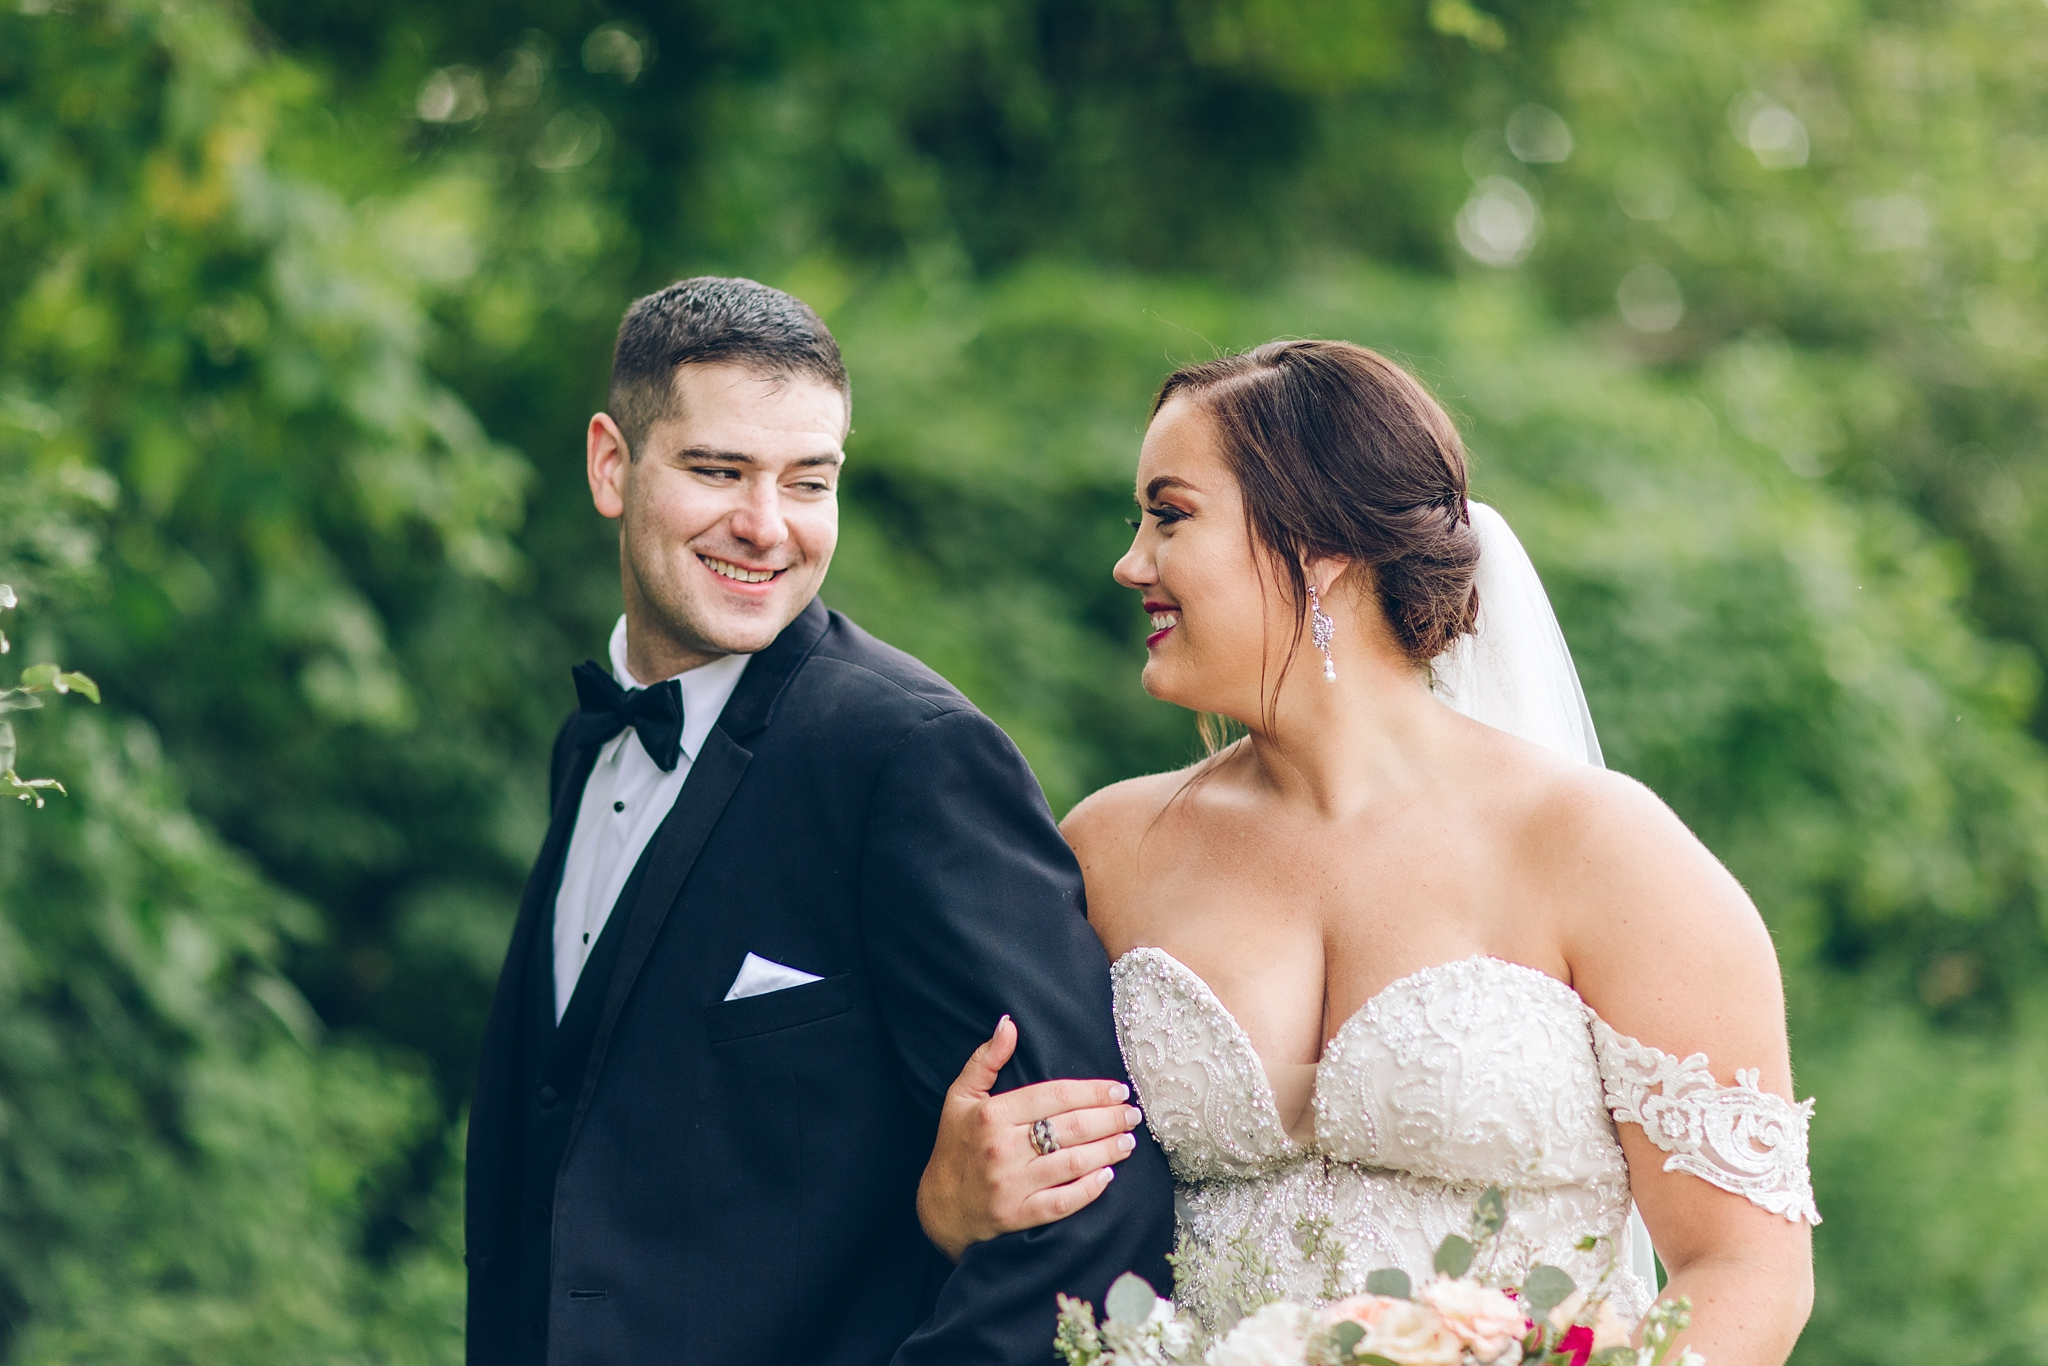 baker-lofts-holland-michigan-wedding-photographer_0346.jpg